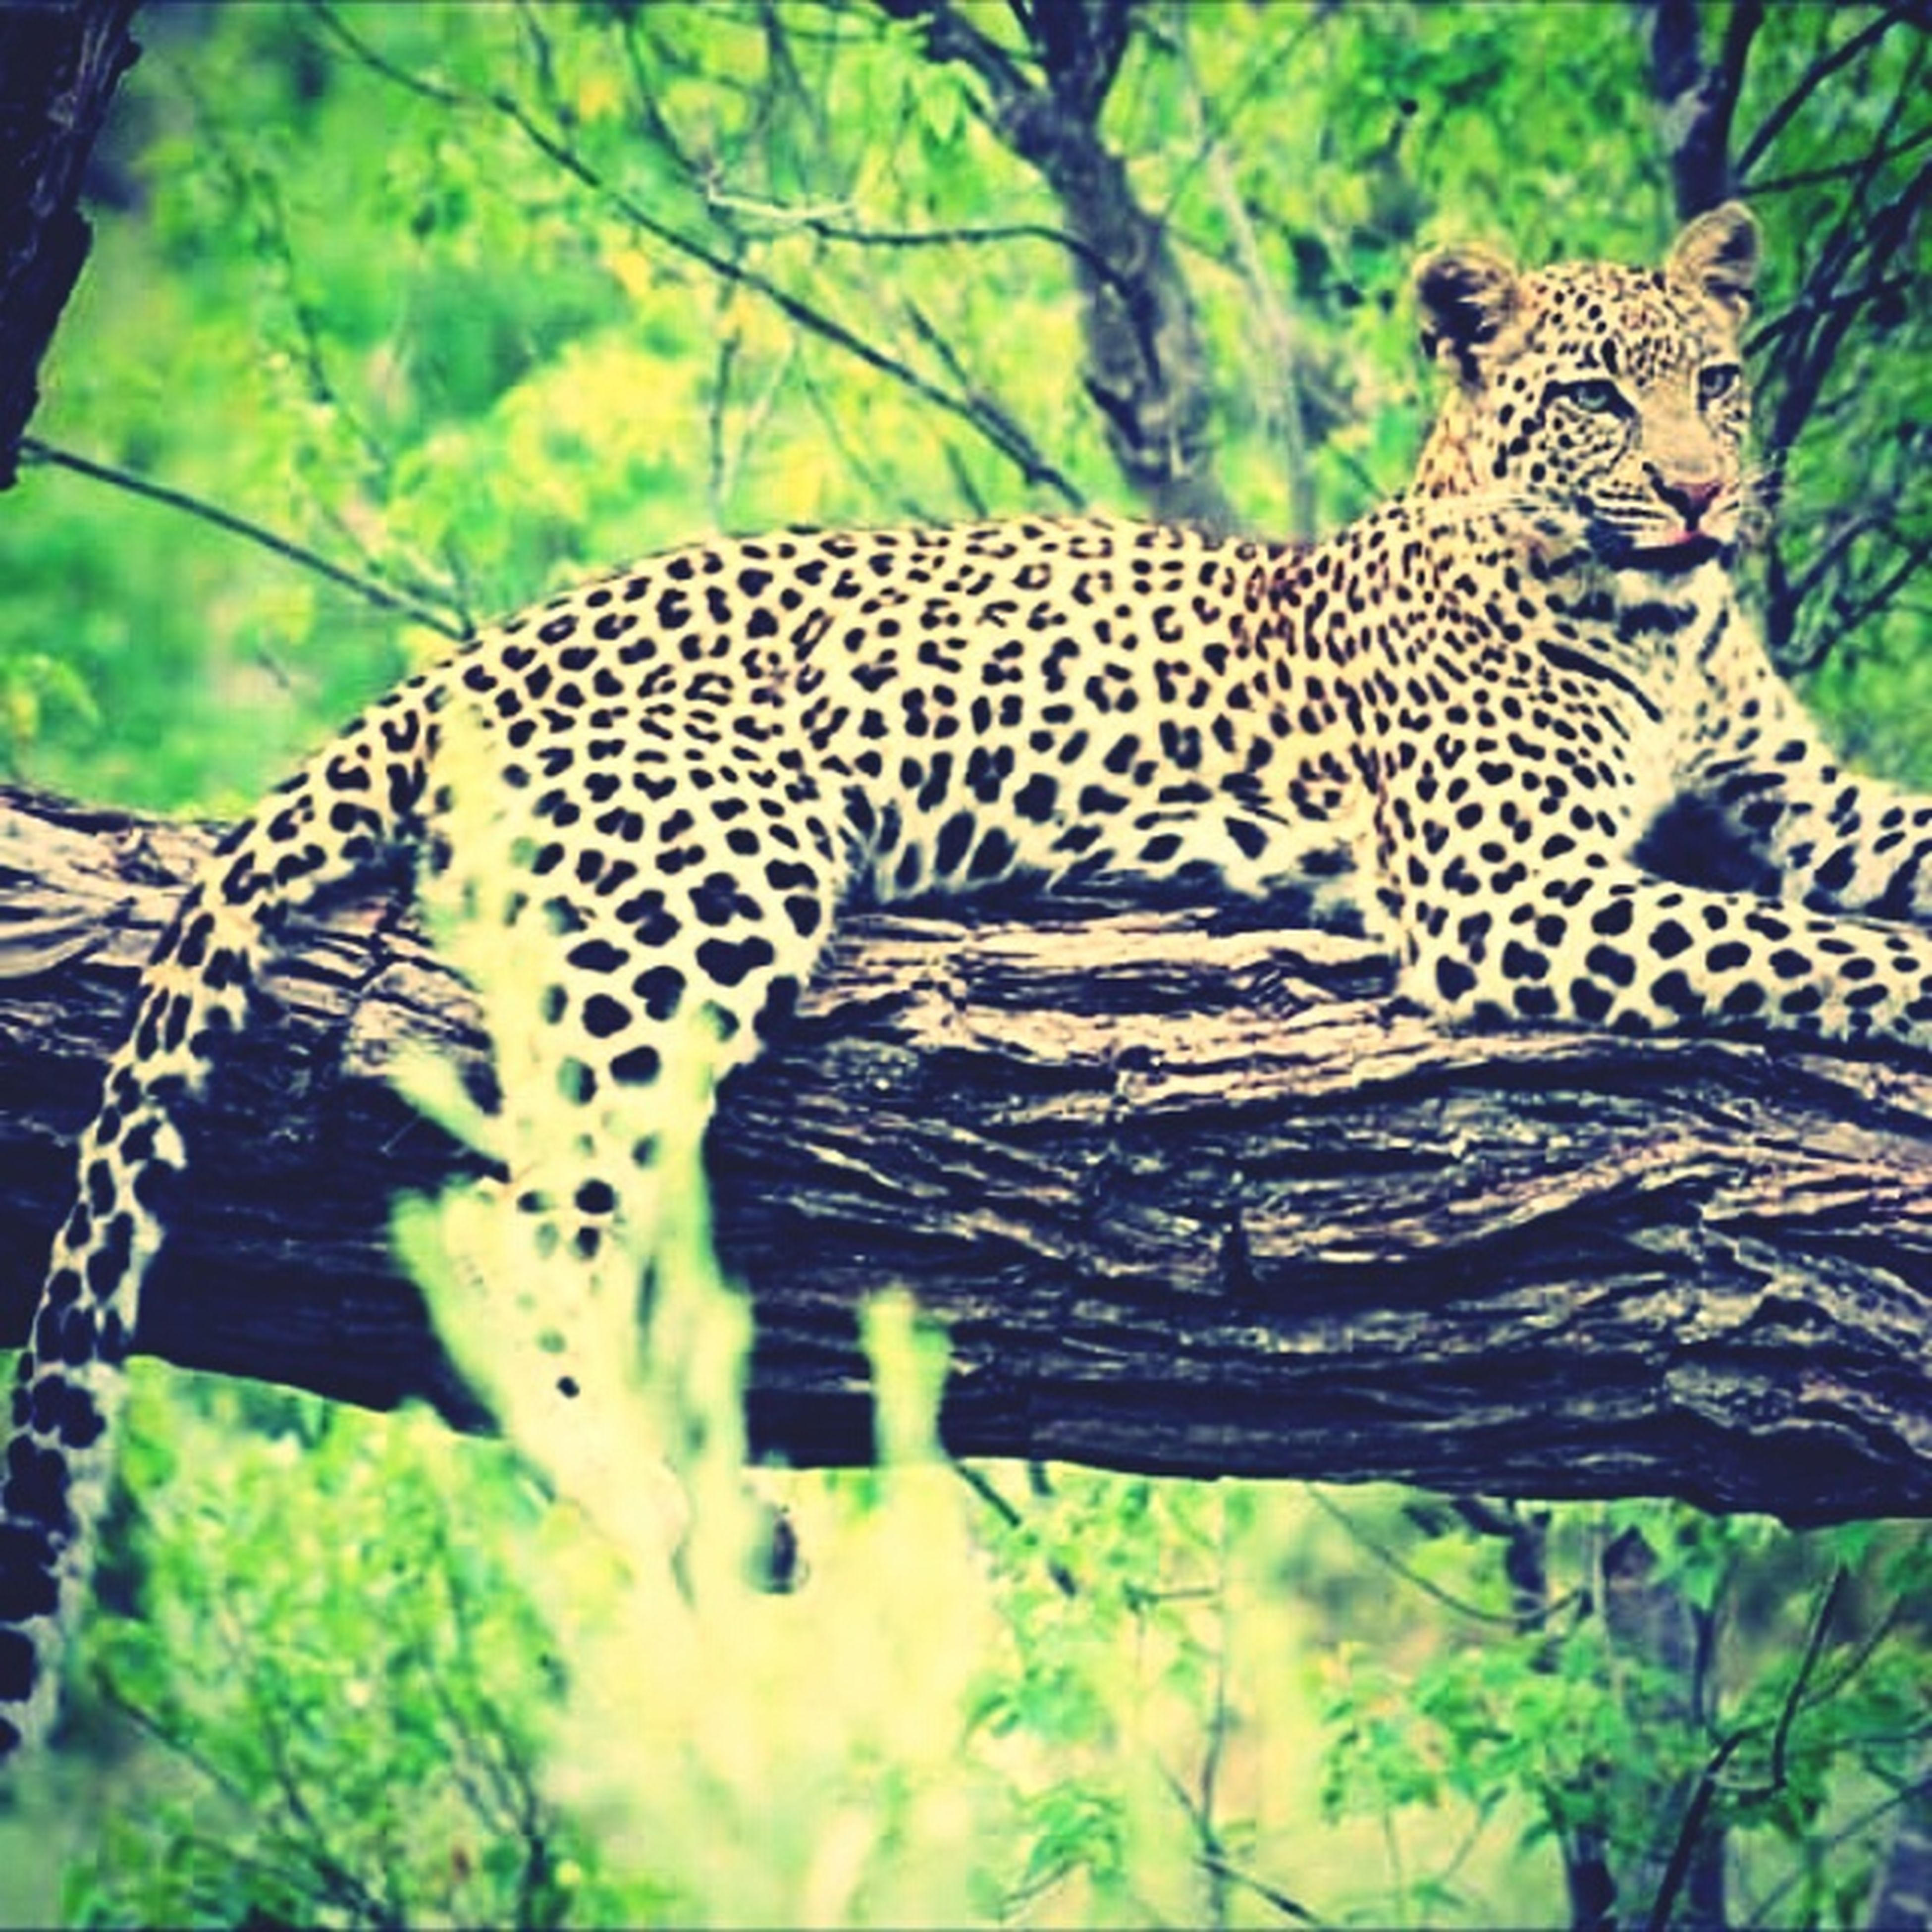 animal themes, mammal, one animal, animal markings, tiger, safari animals, leopard, wildlife, animals in the wild, endangered species, natural pattern, undomesticated cat, zoo, big cat, feline, forest, tree, giraffe, relaxation, animal head